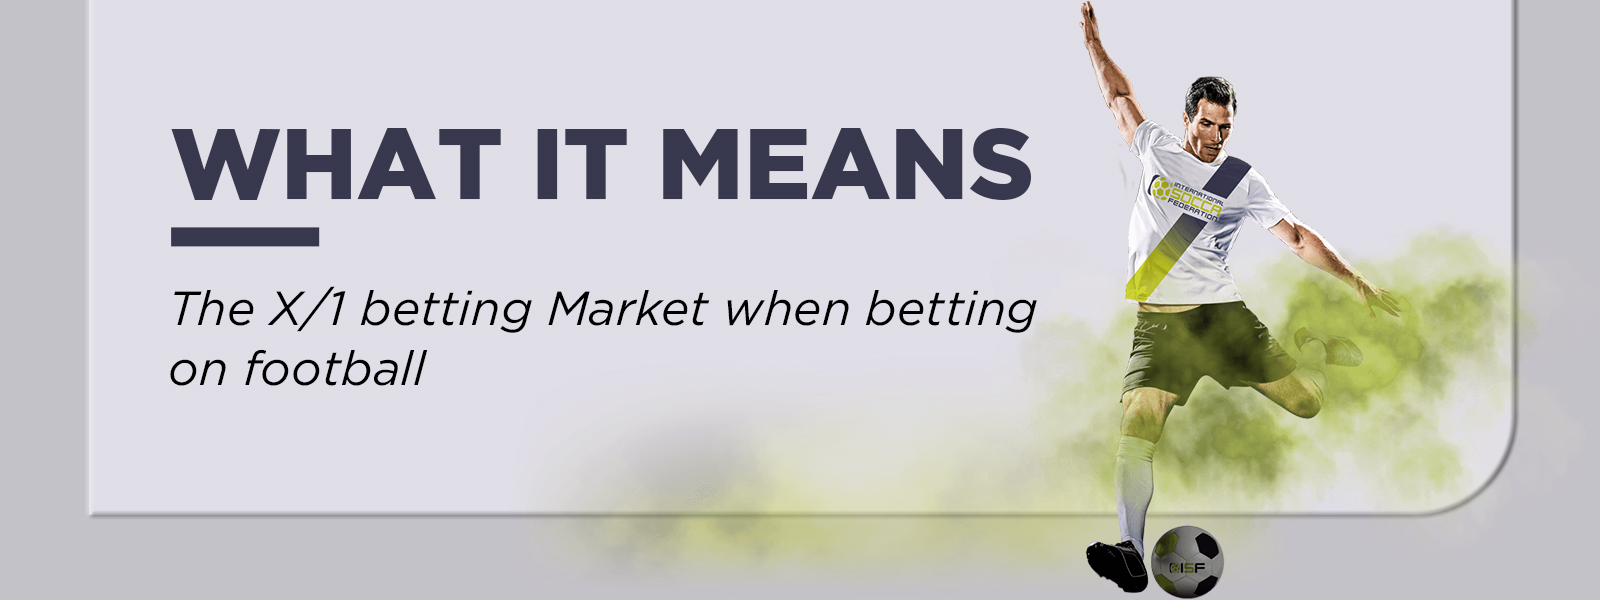 online soccer betting thailand post